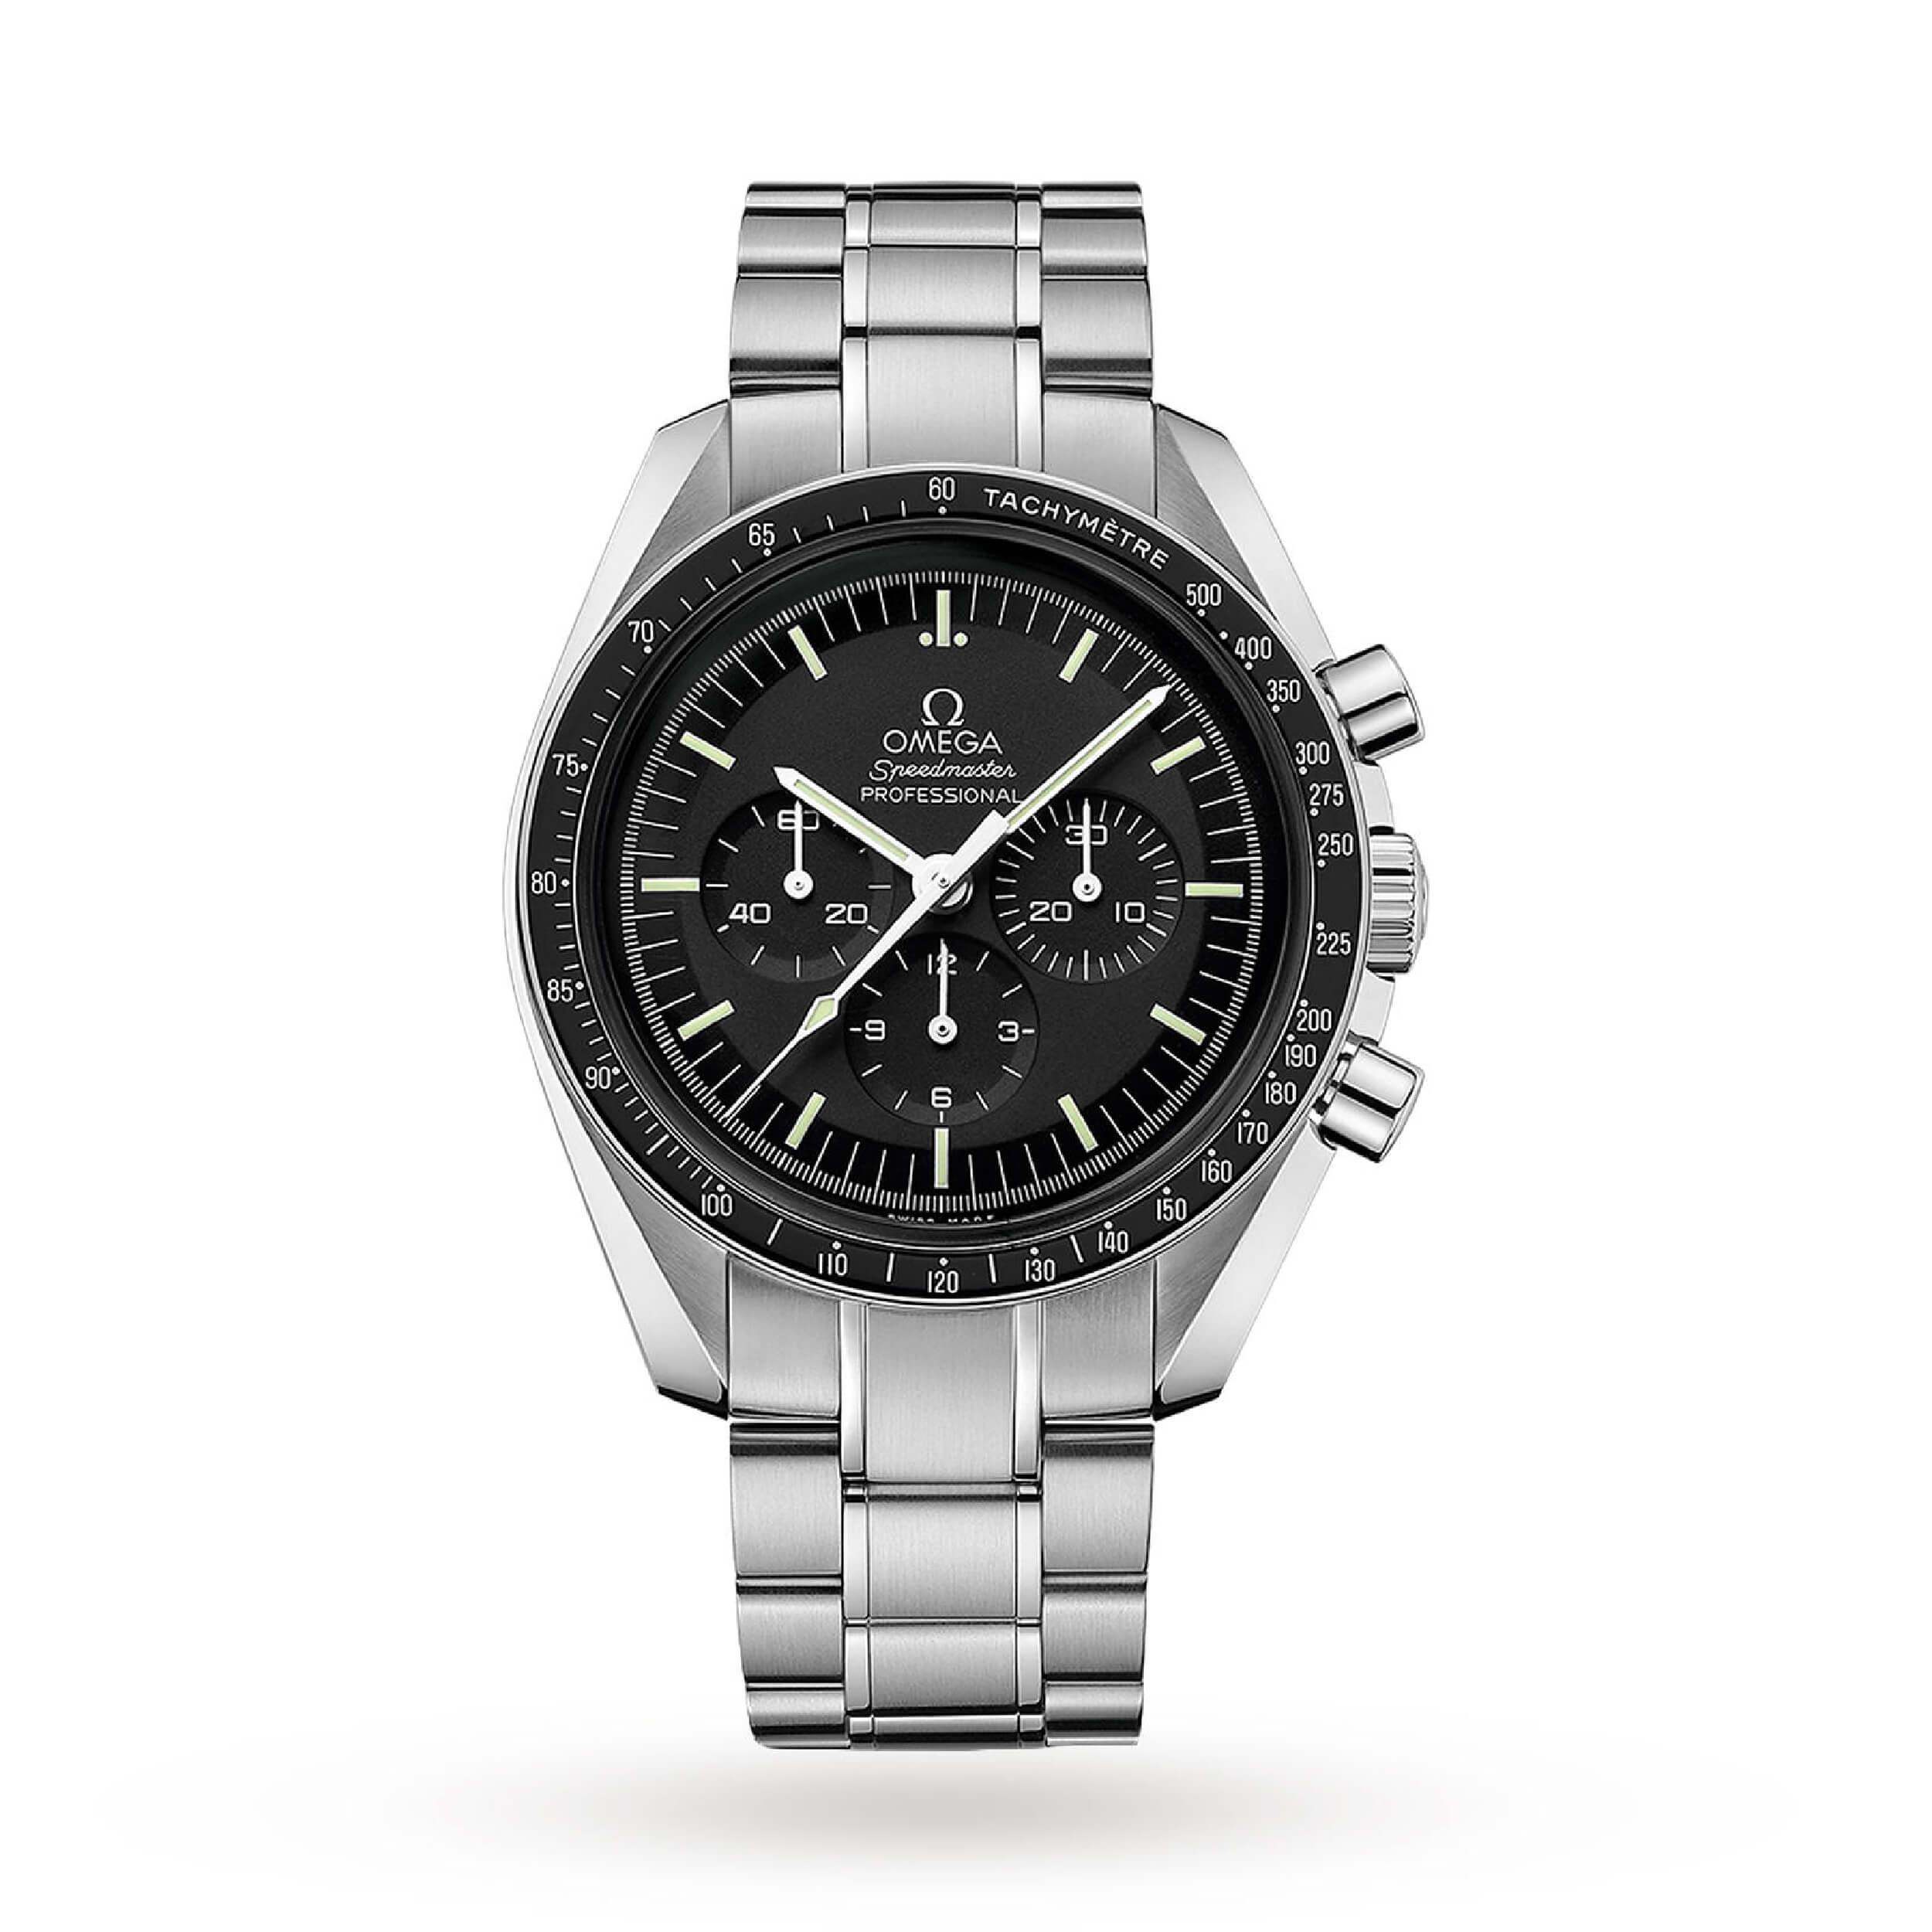 Omega Speedmaster Moonwatch Professional | Best Luxury Chronograph Watches 2021